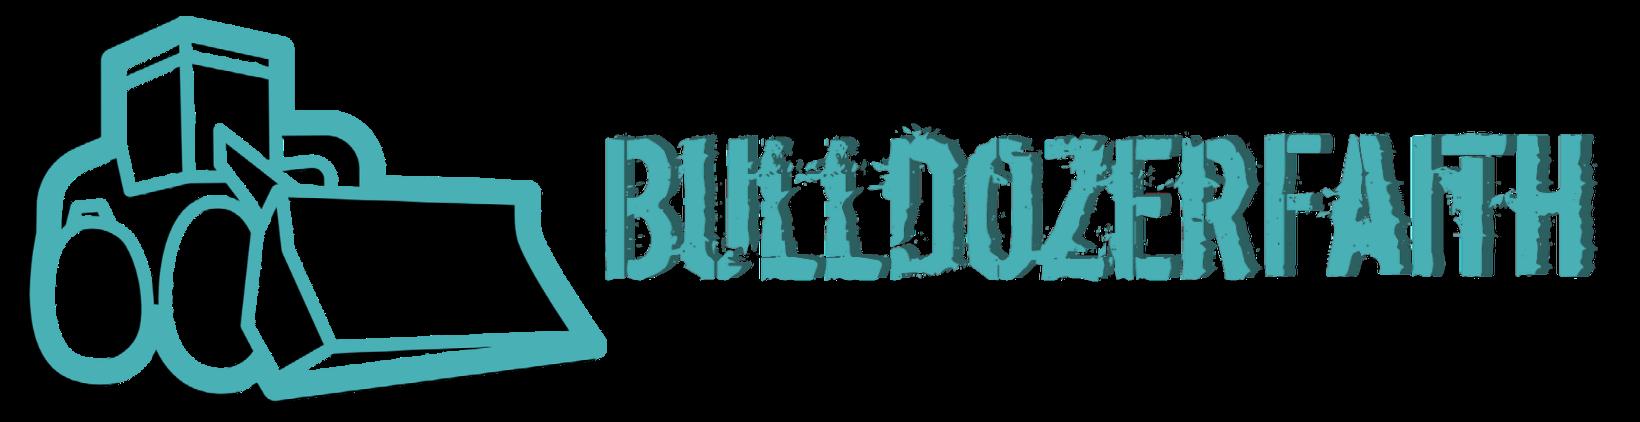 Bulldozerfaith